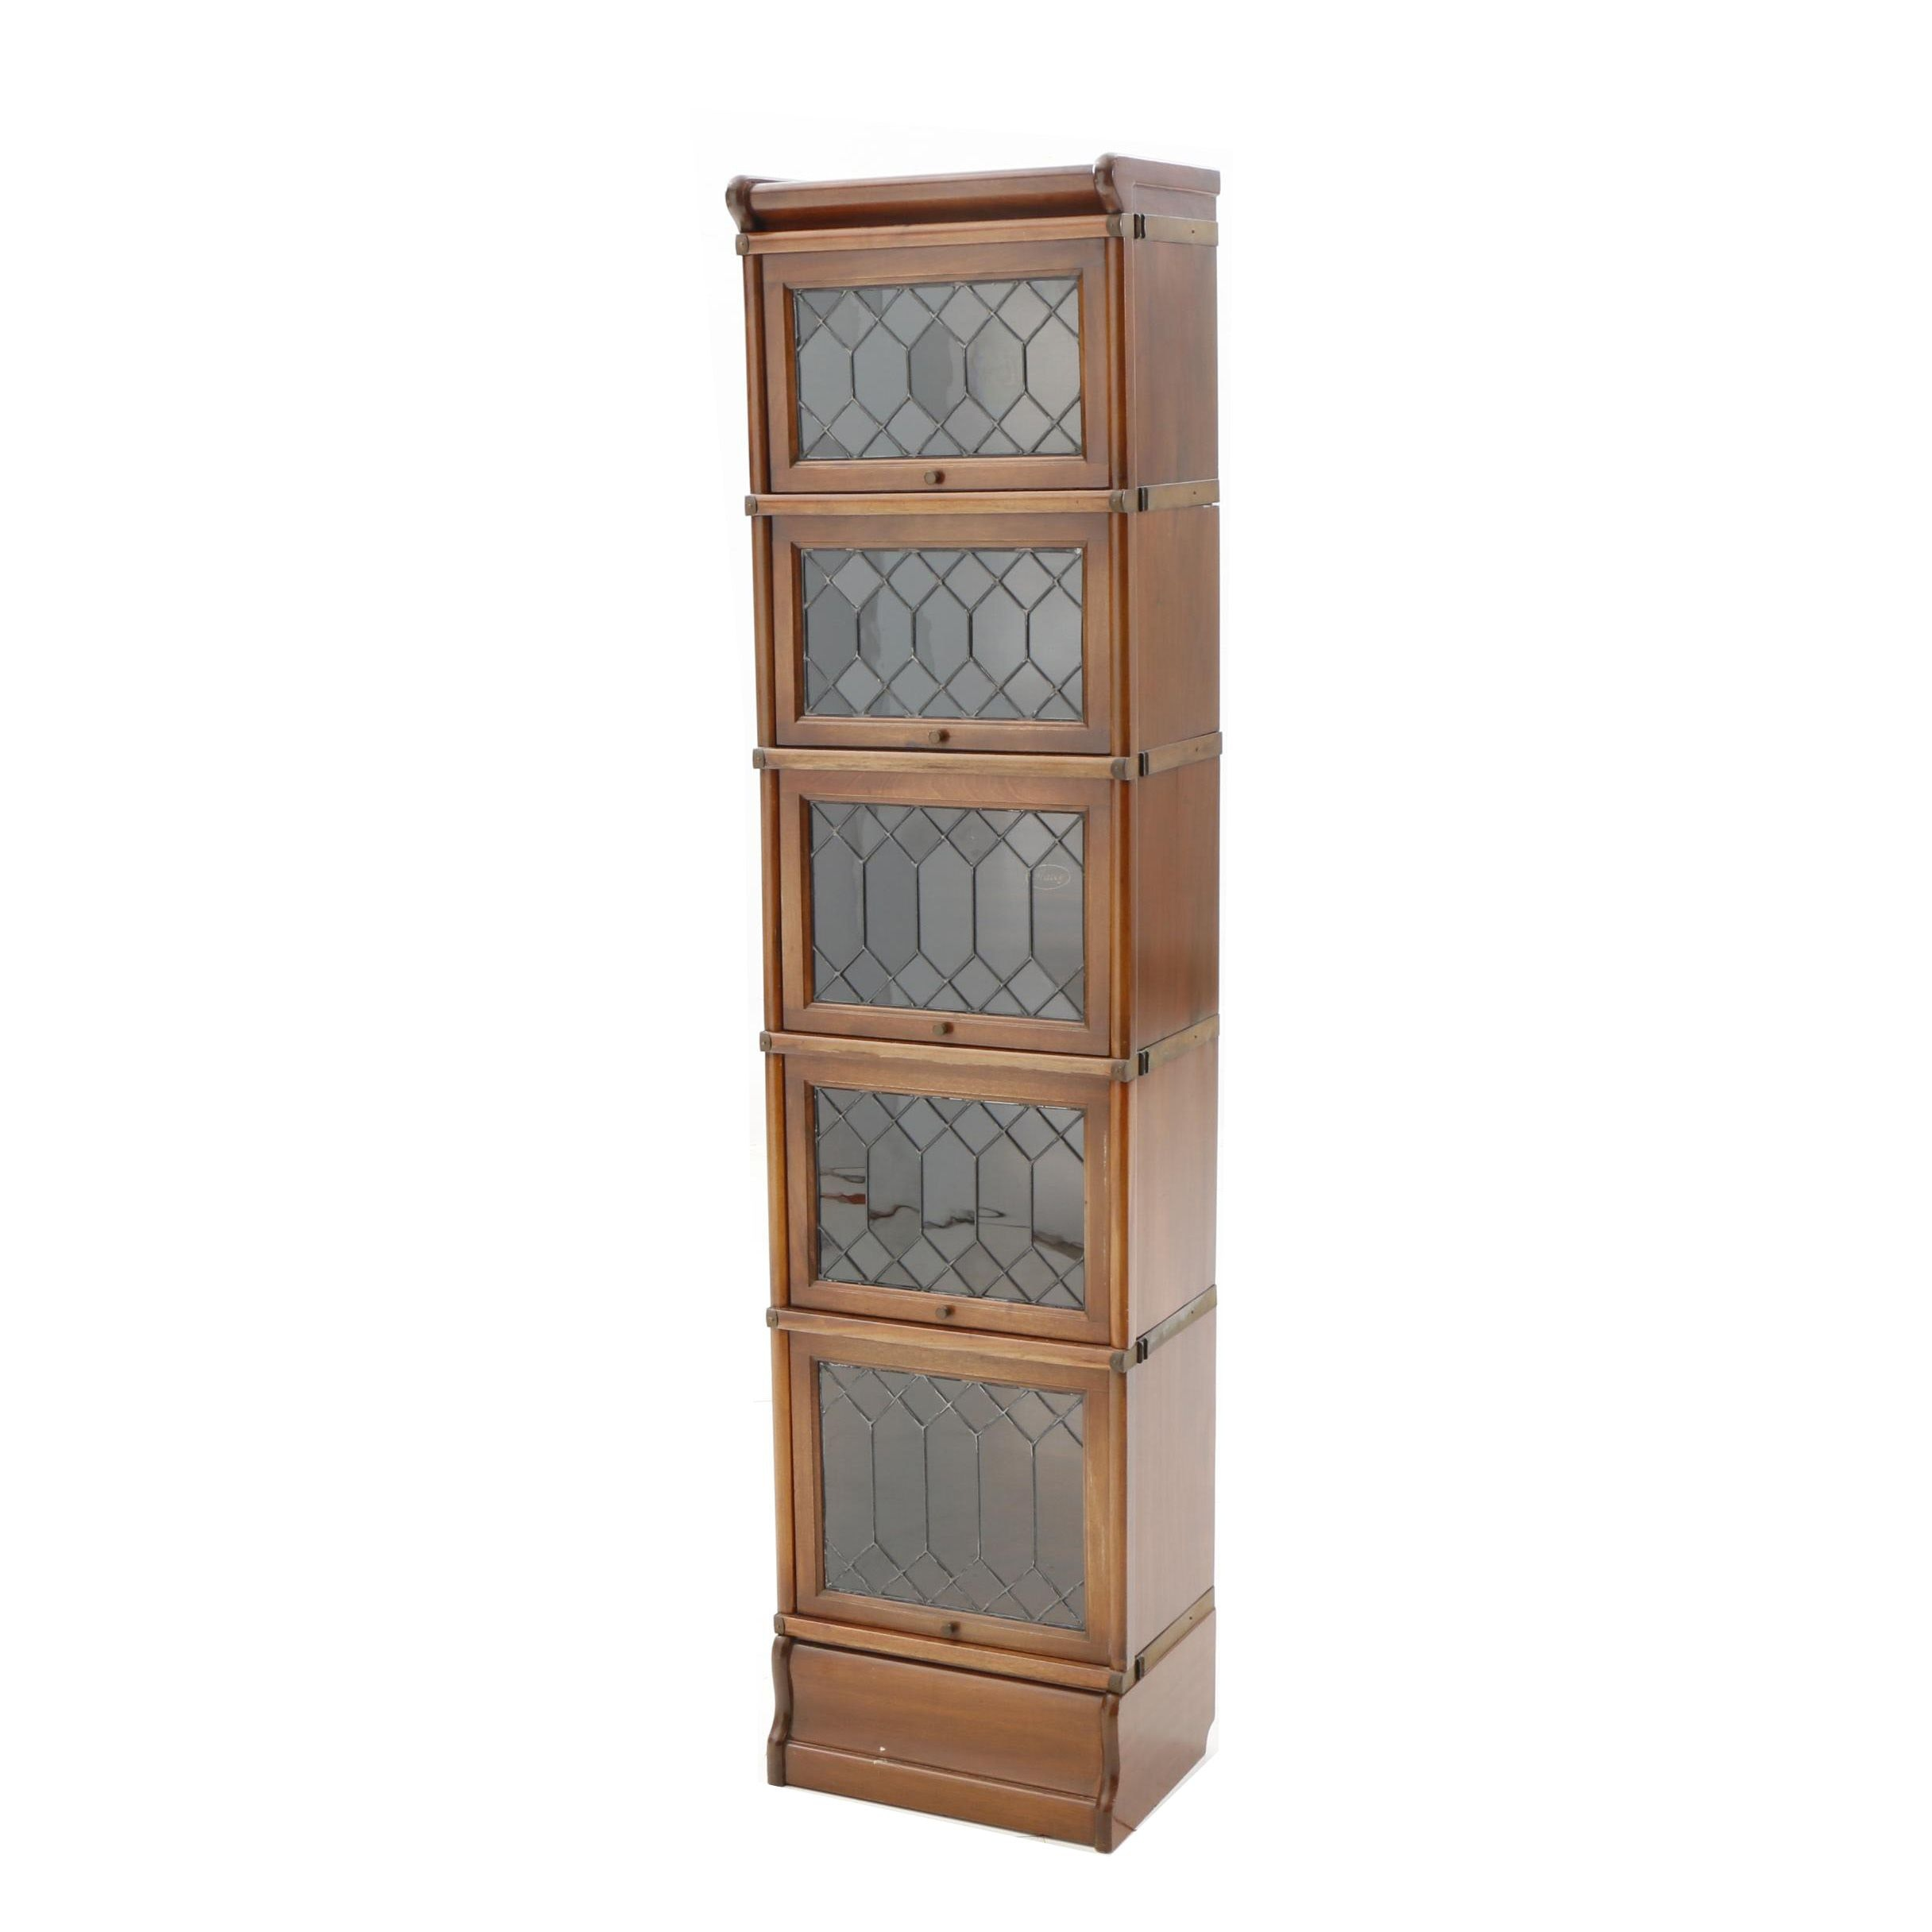 Narrow Mahogany Barrister Bookcase by Macey